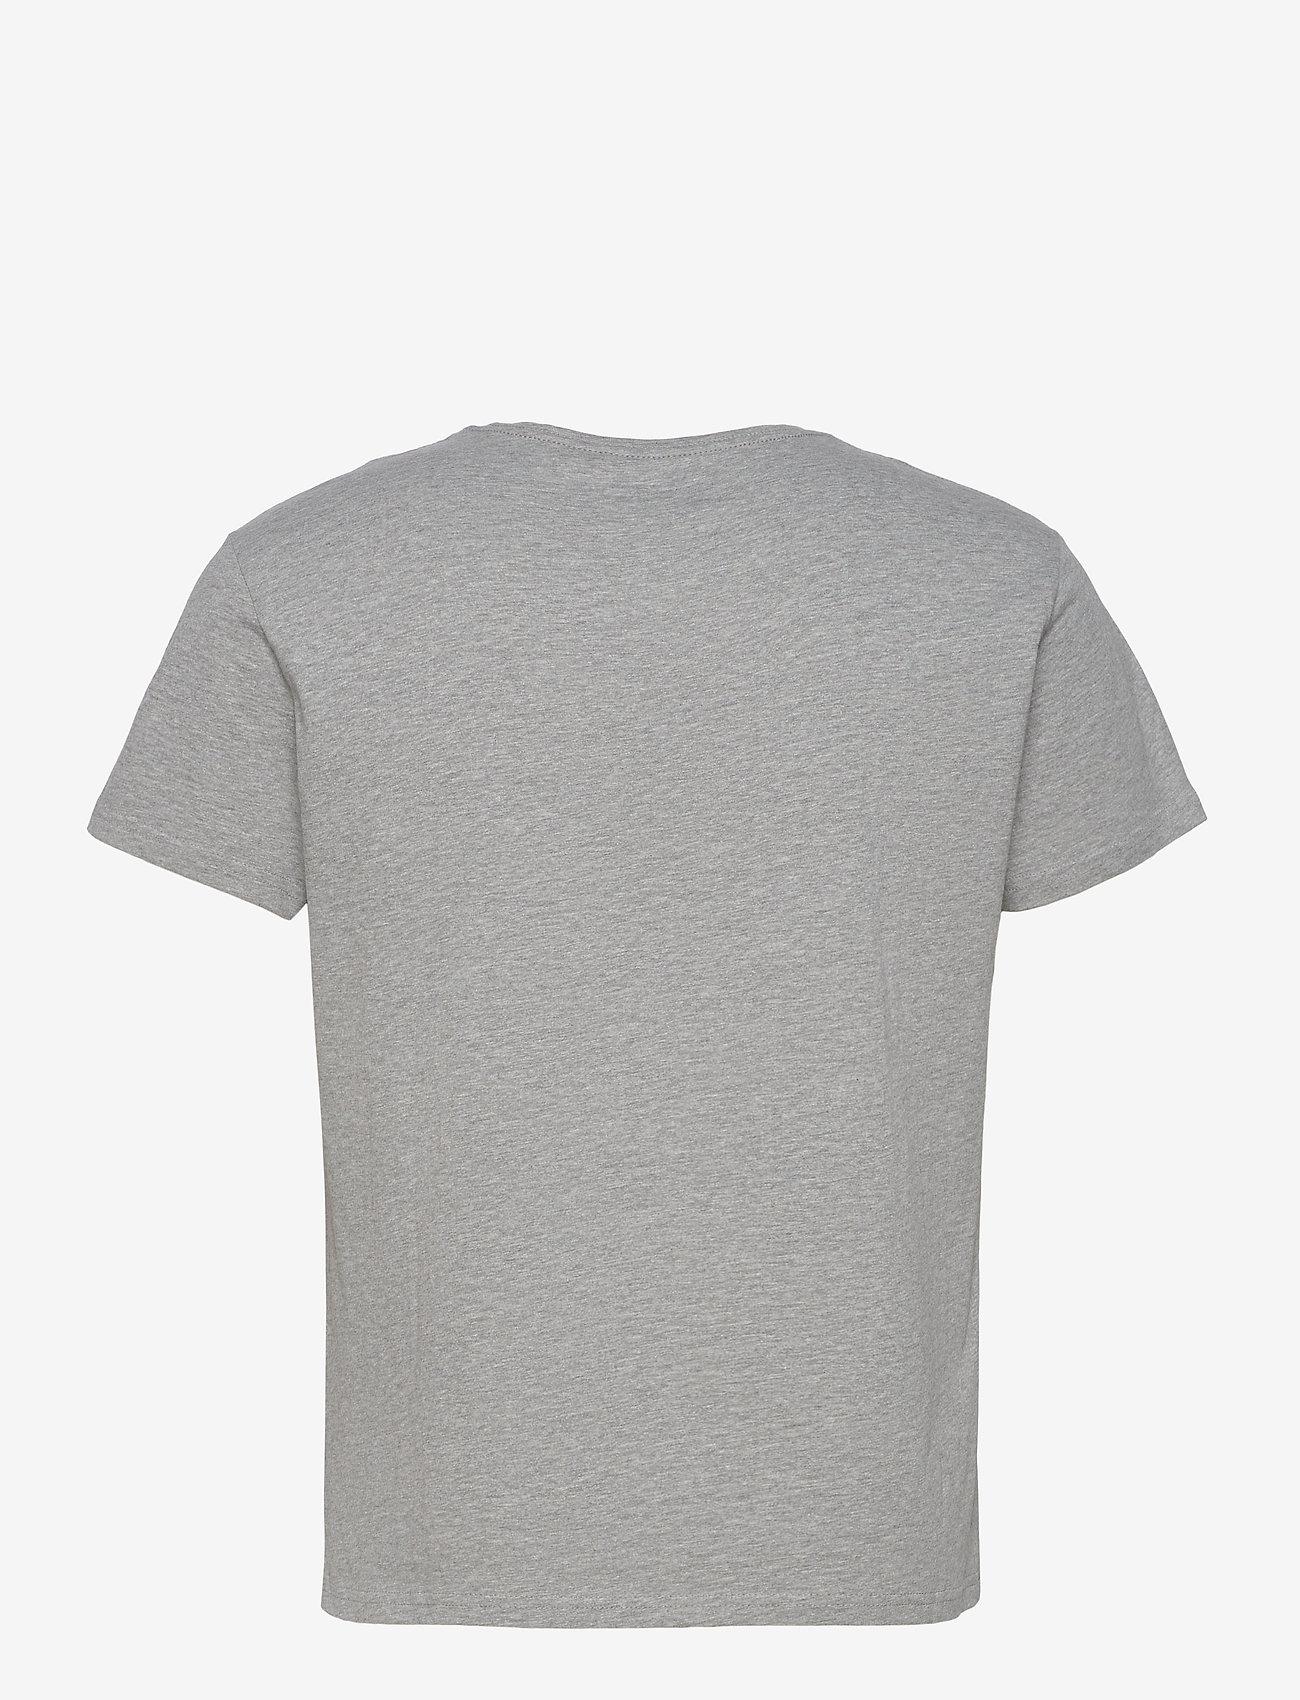 Blend - Tee - basic t-shirts - stone mix - 1